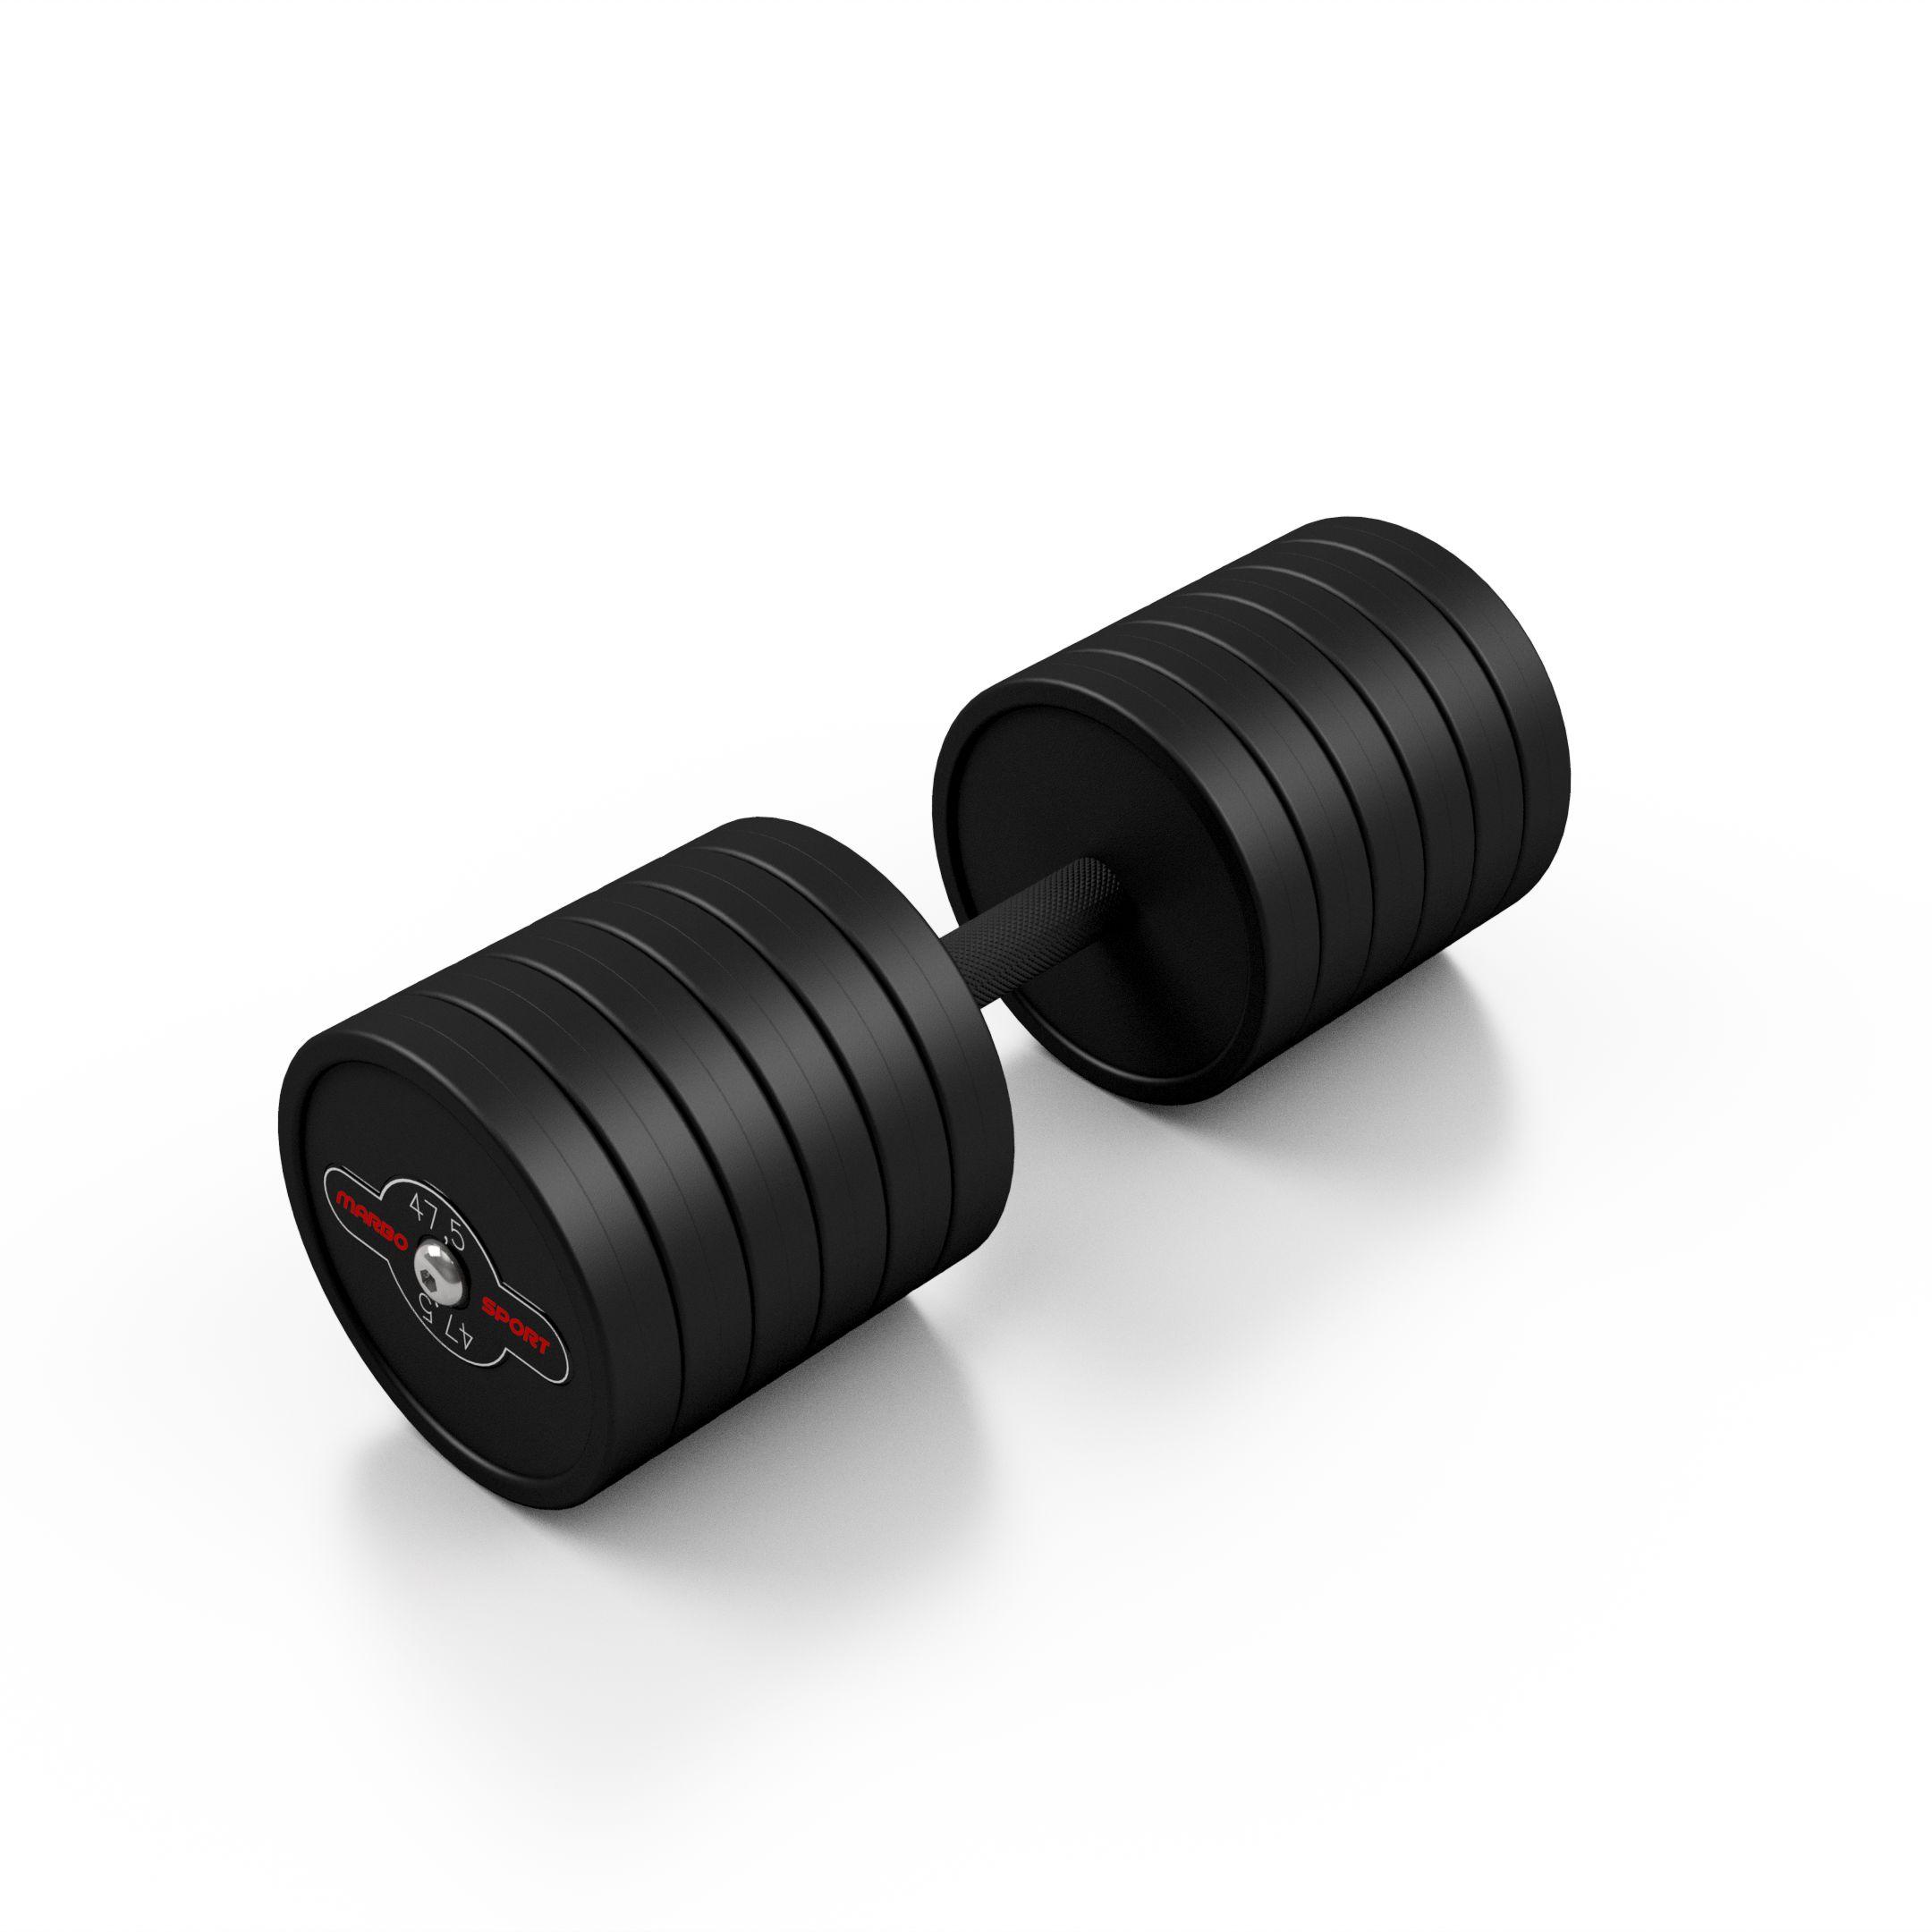 Hantla stalowa gumowana 47,5 kg czarny mat - Marbo Sport - 47,5 kg